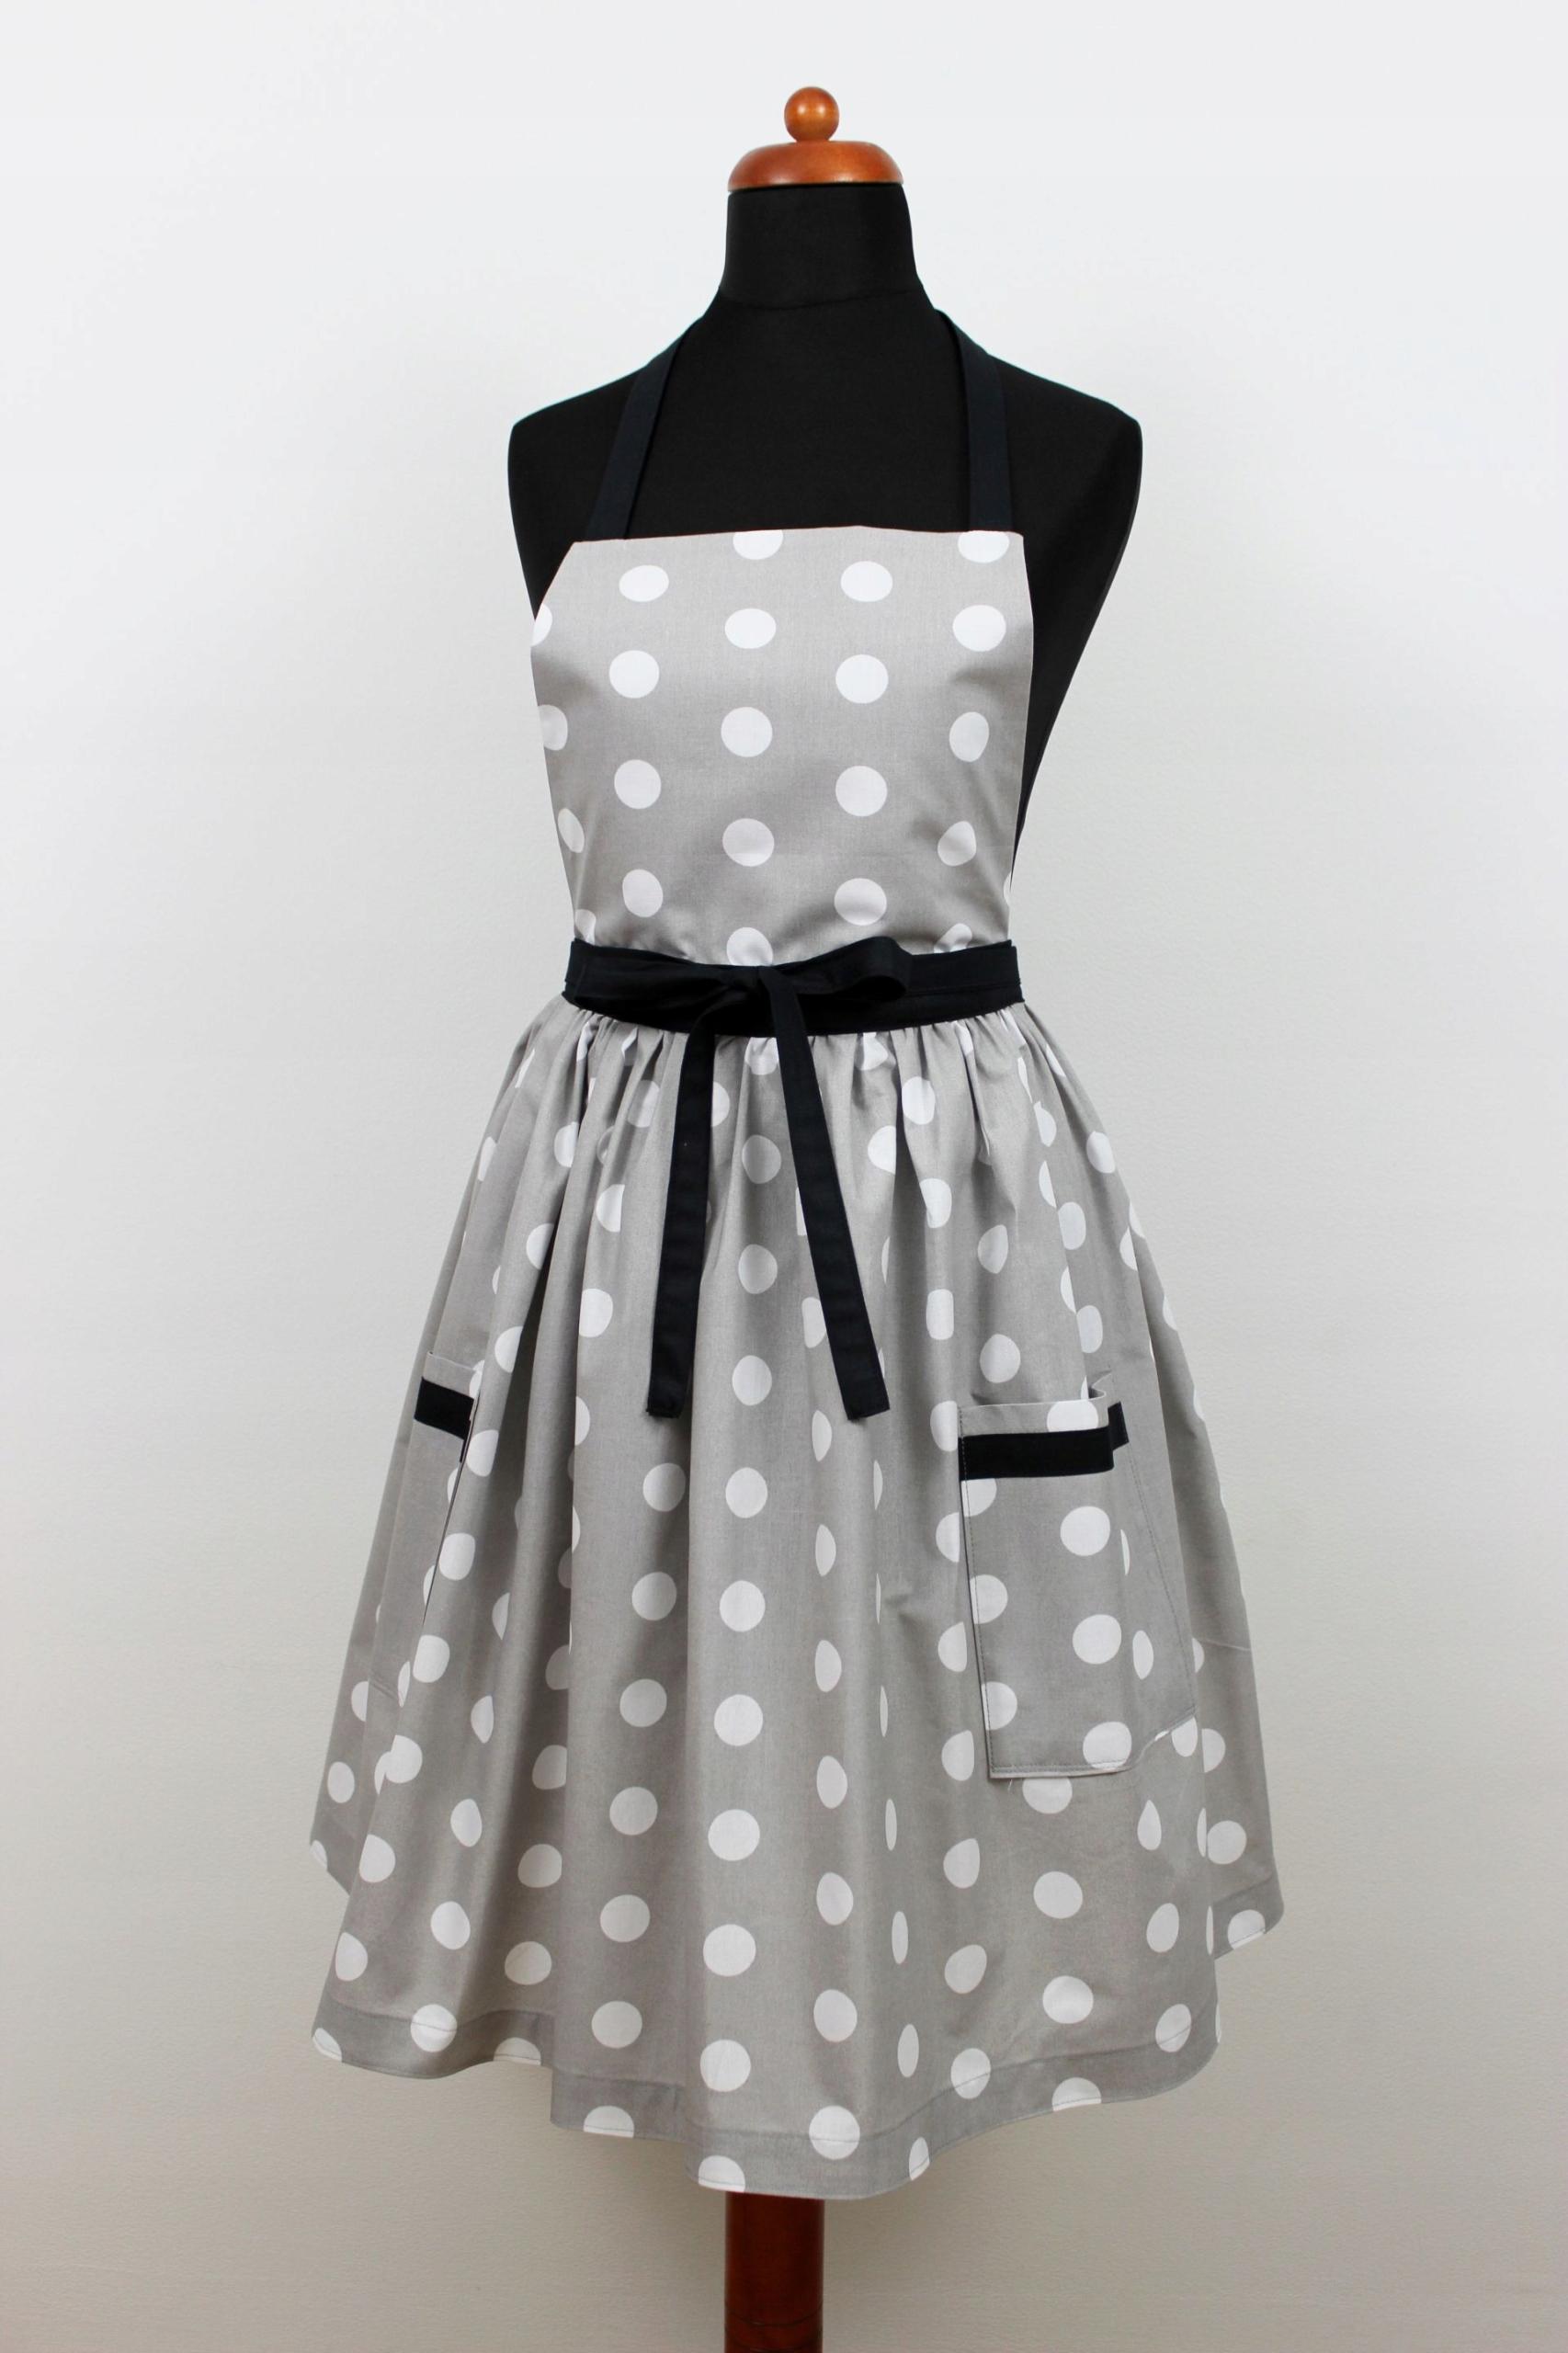 Zástera šaty polka dot retro vrecká